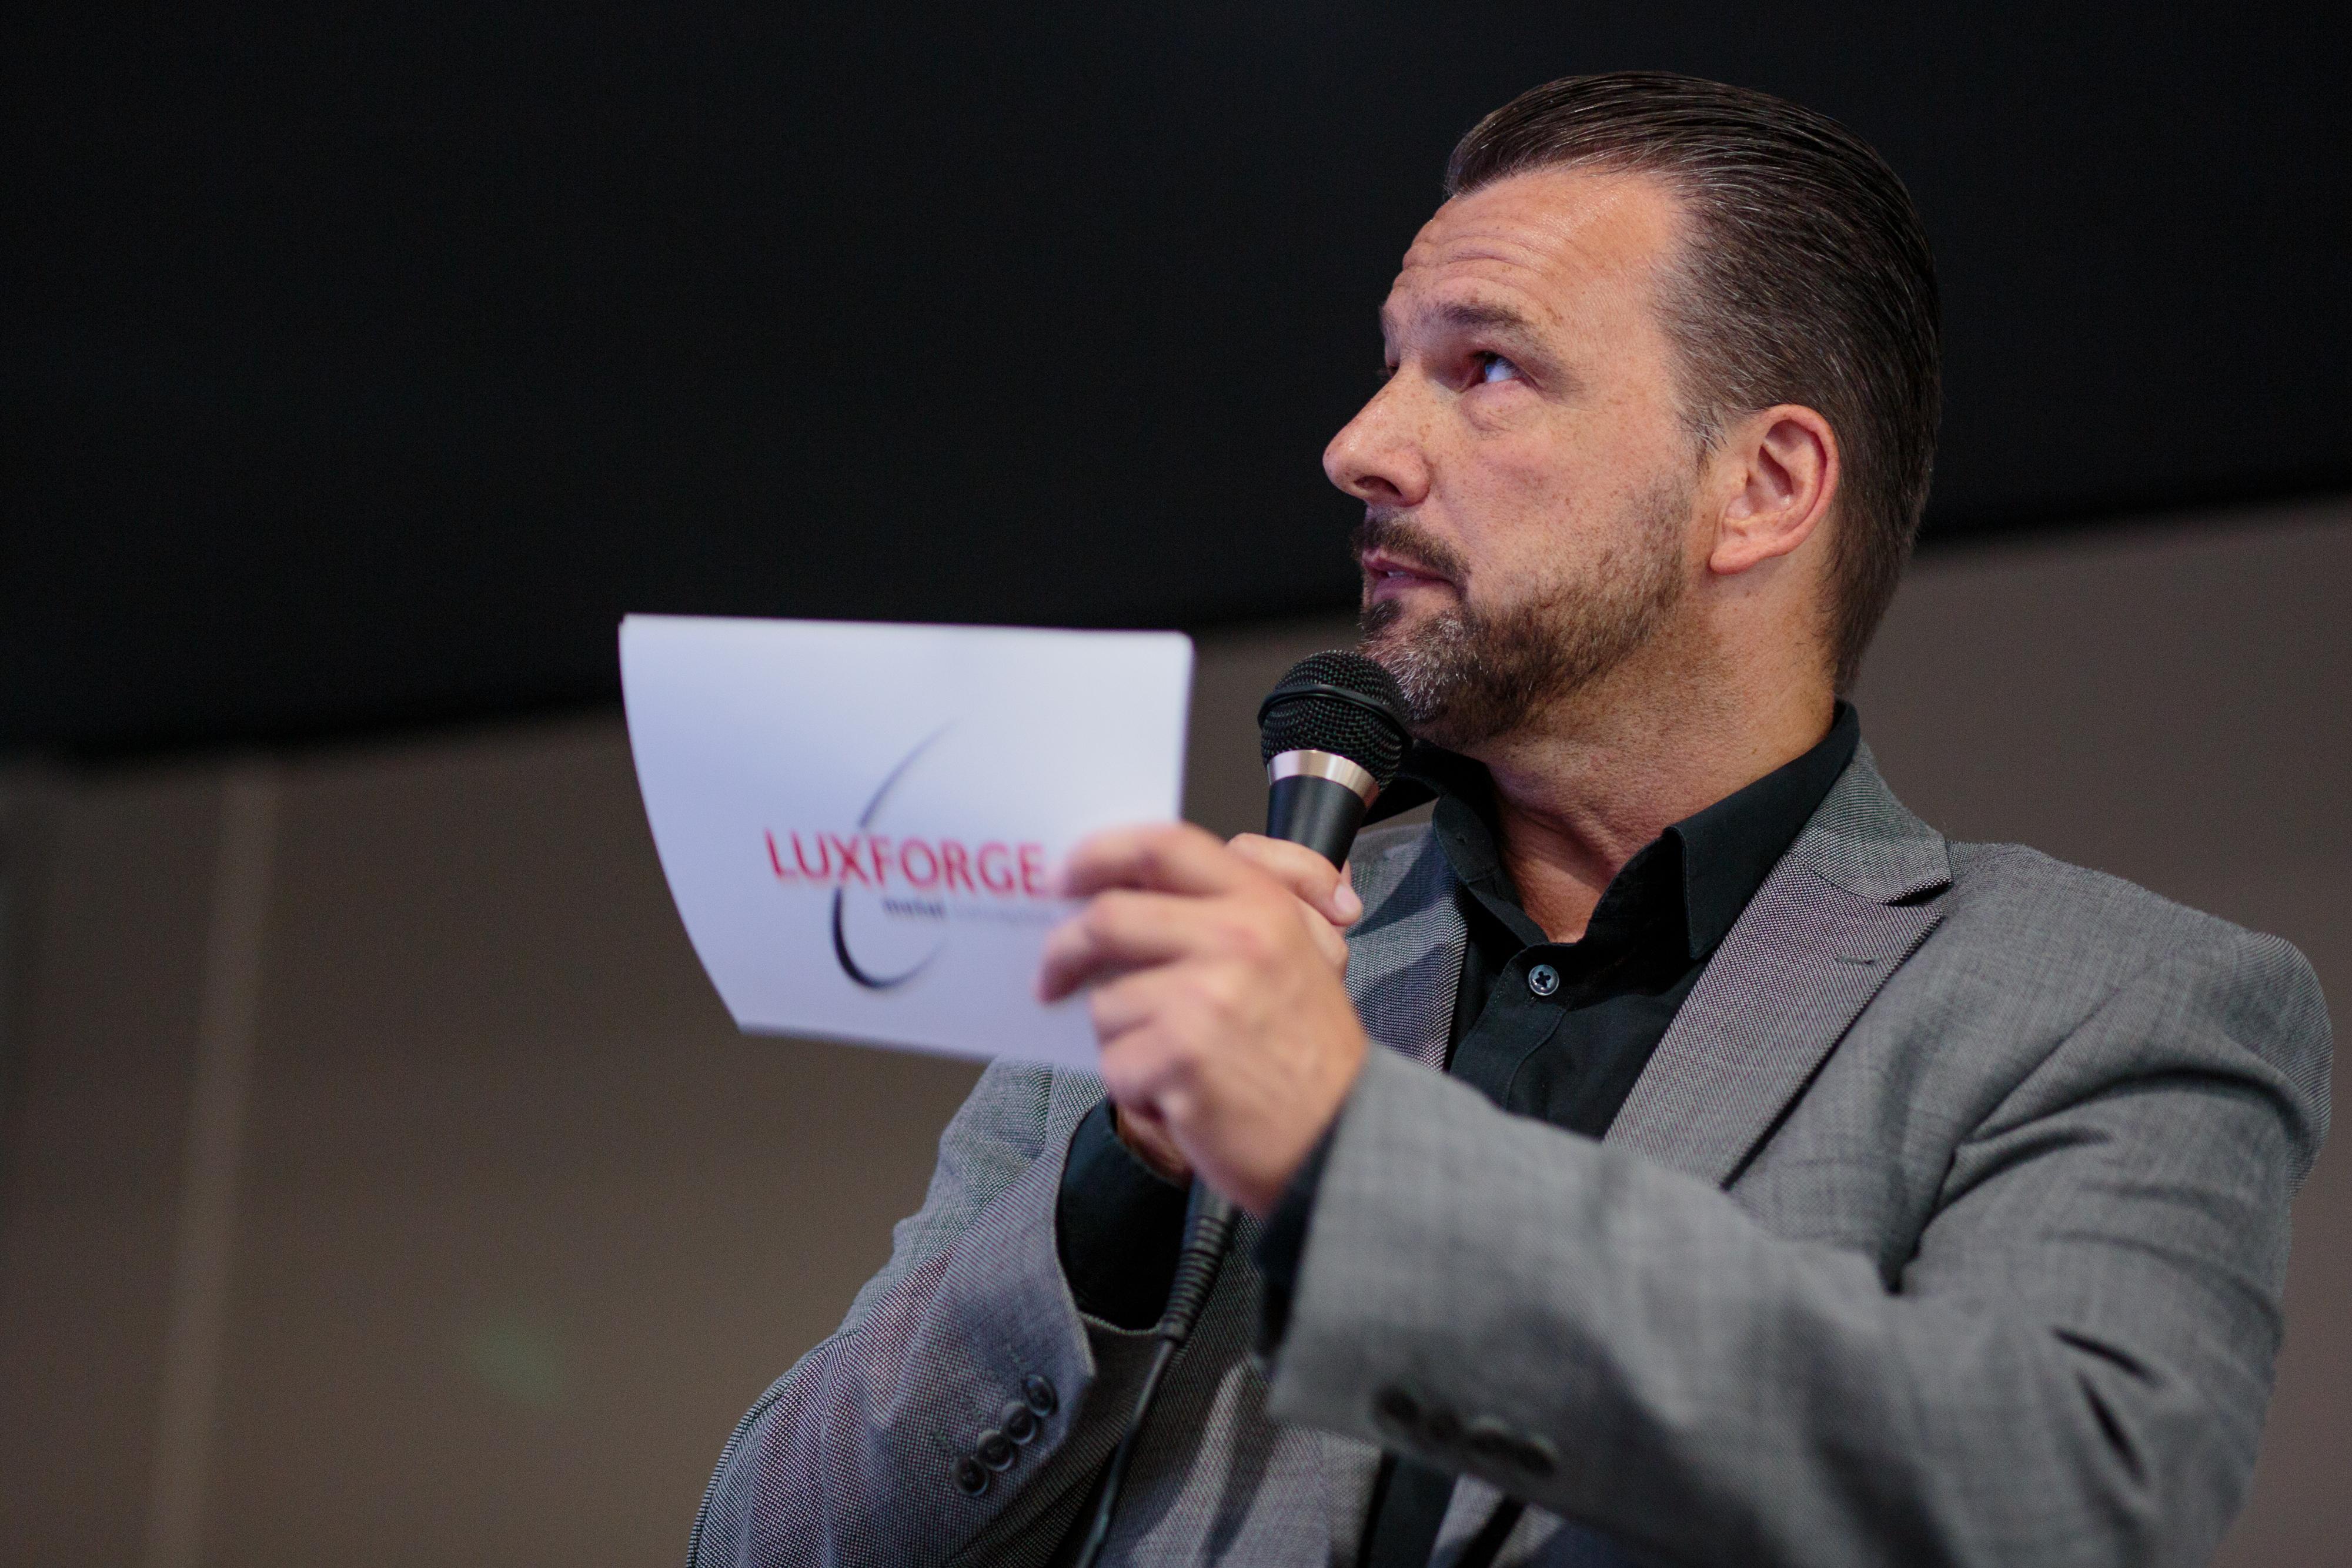 Jean-Louis Blanken, Luxforge